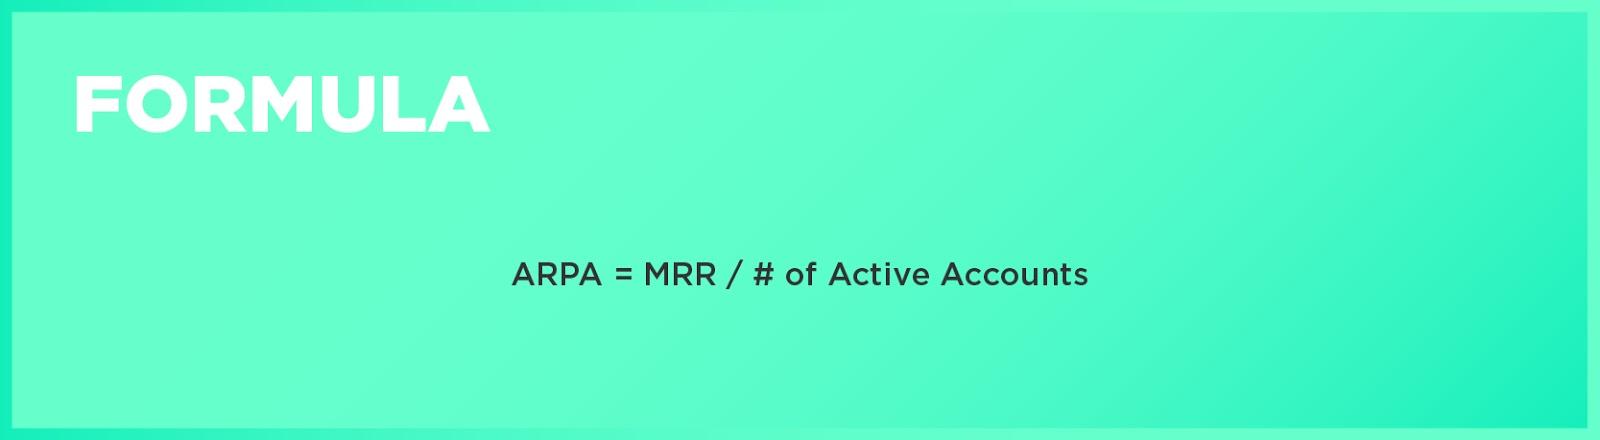 Formula: ARPA = MRR / # of Active Accounts